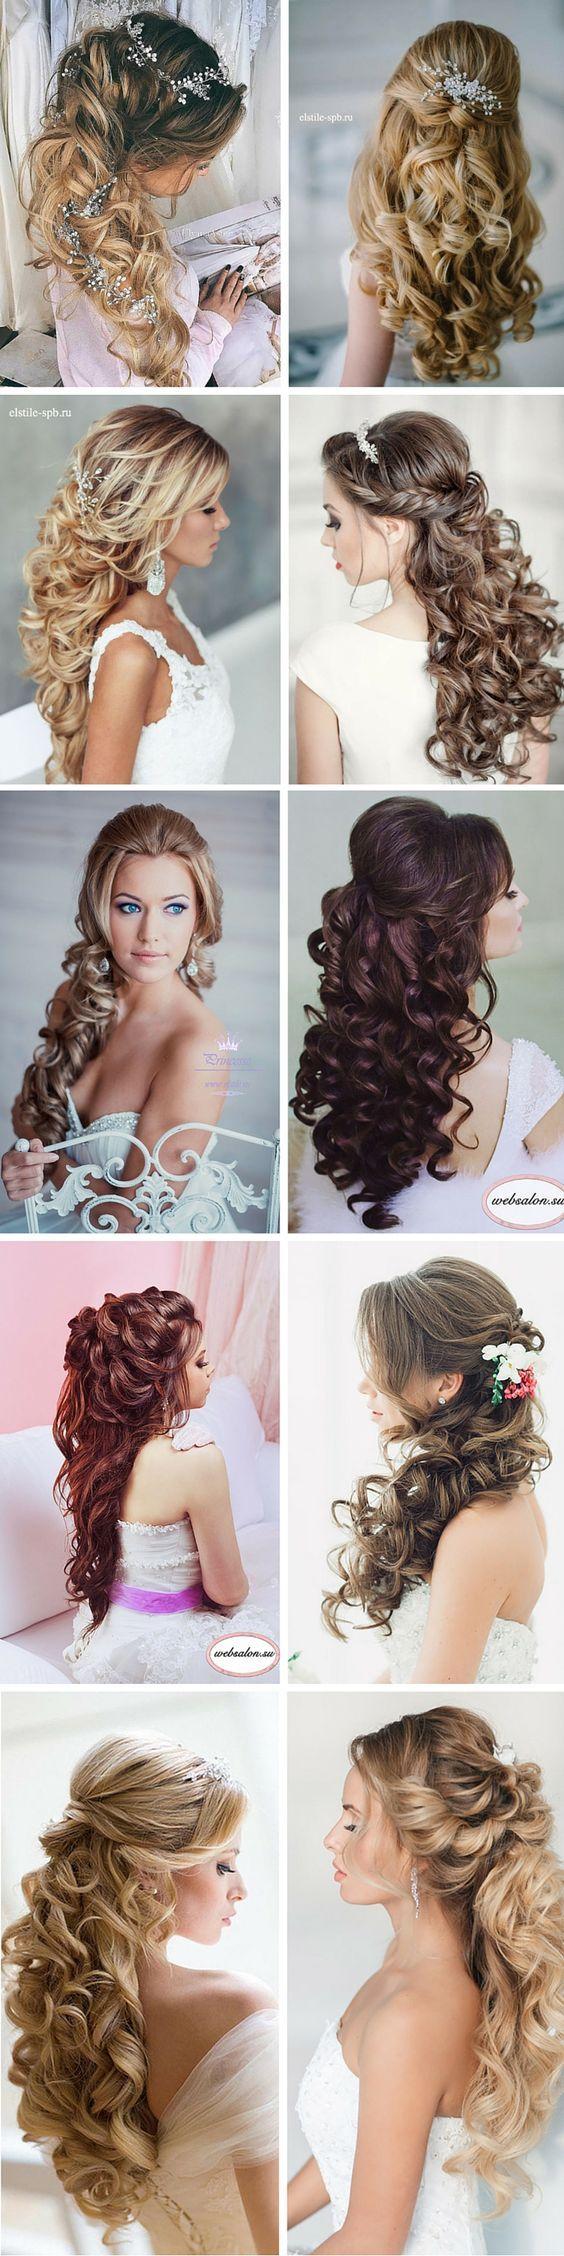 Penteados winter formal pinterest hair style curly